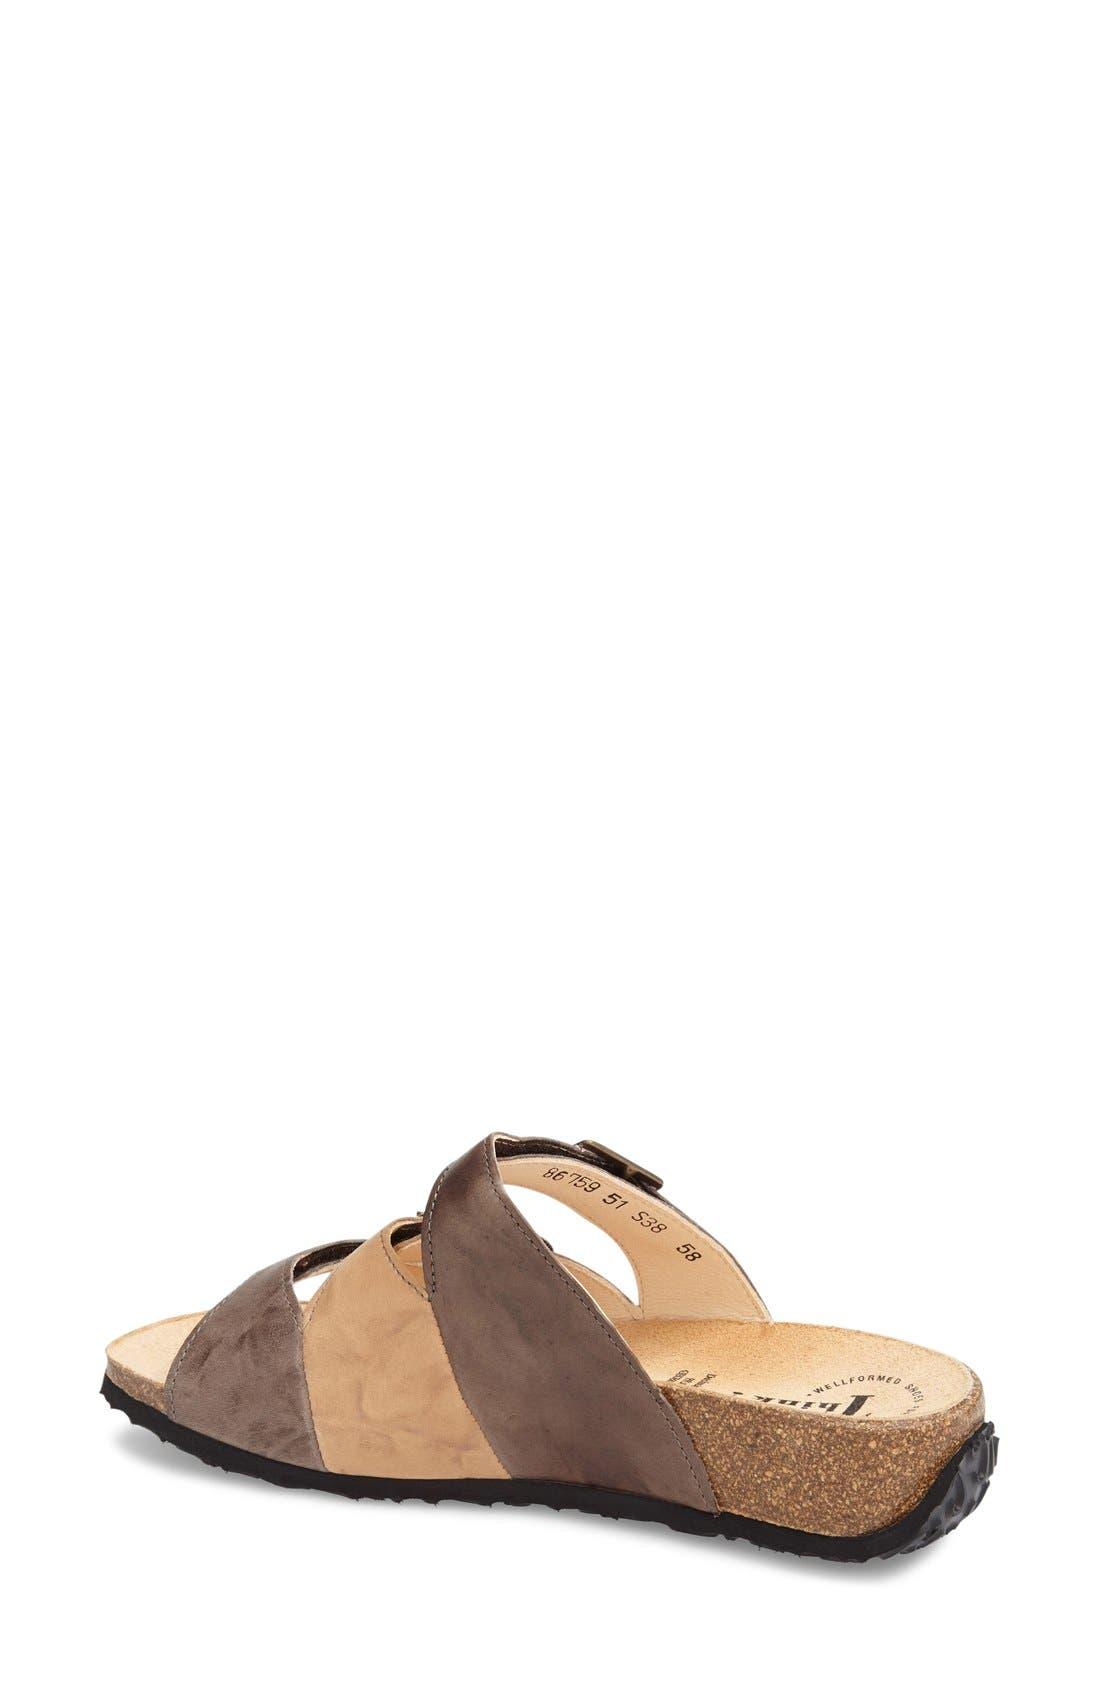 'Mizzi' Sandal,                             Alternate thumbnail 2, color,                             Cappucino Leather